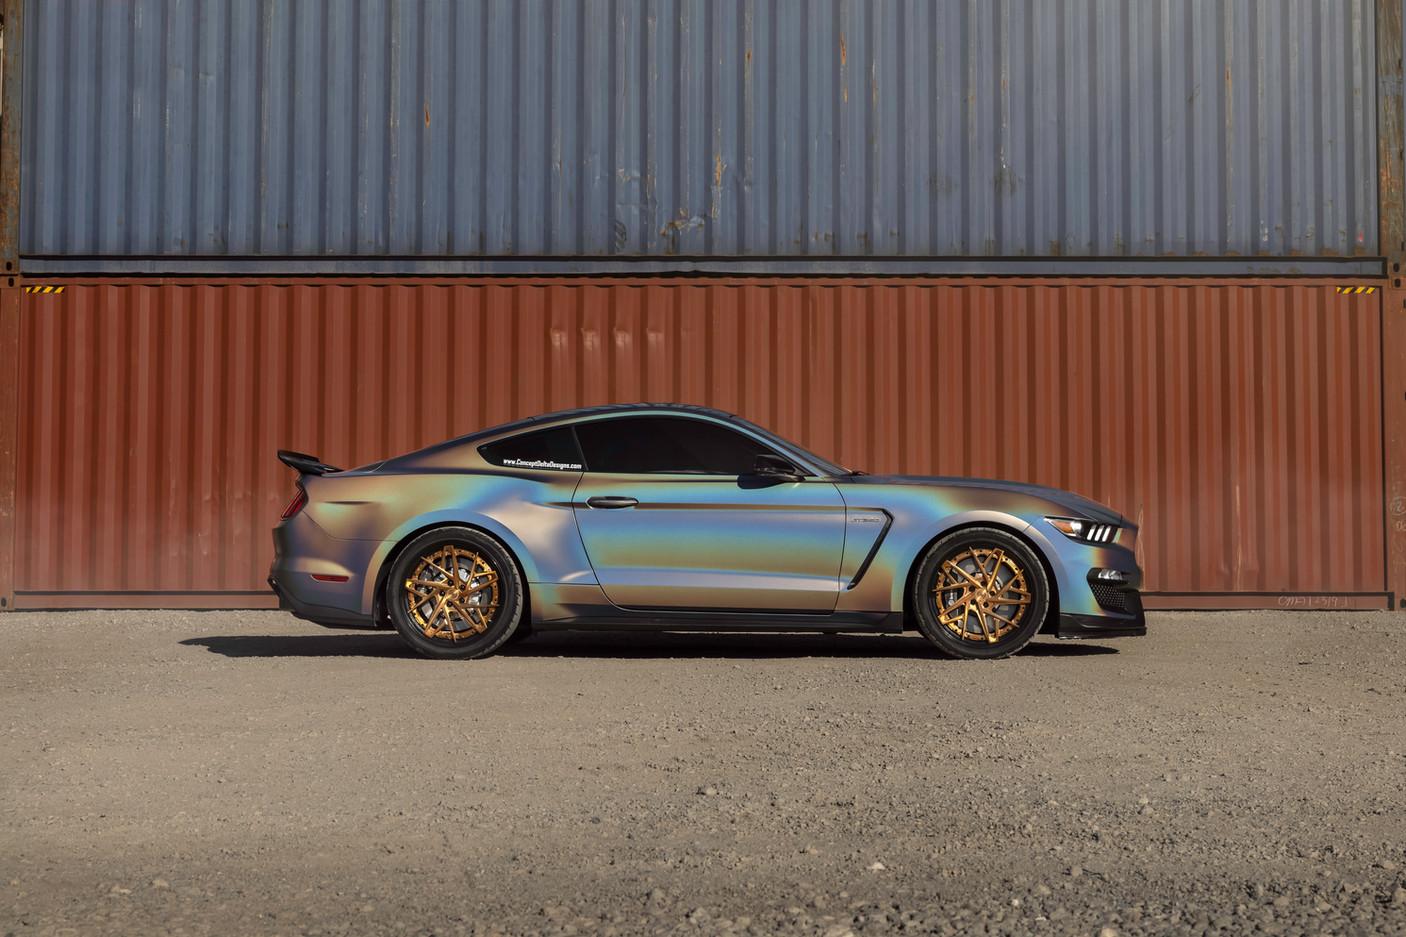 GT350 Wrap, Tint, Custom Wheels